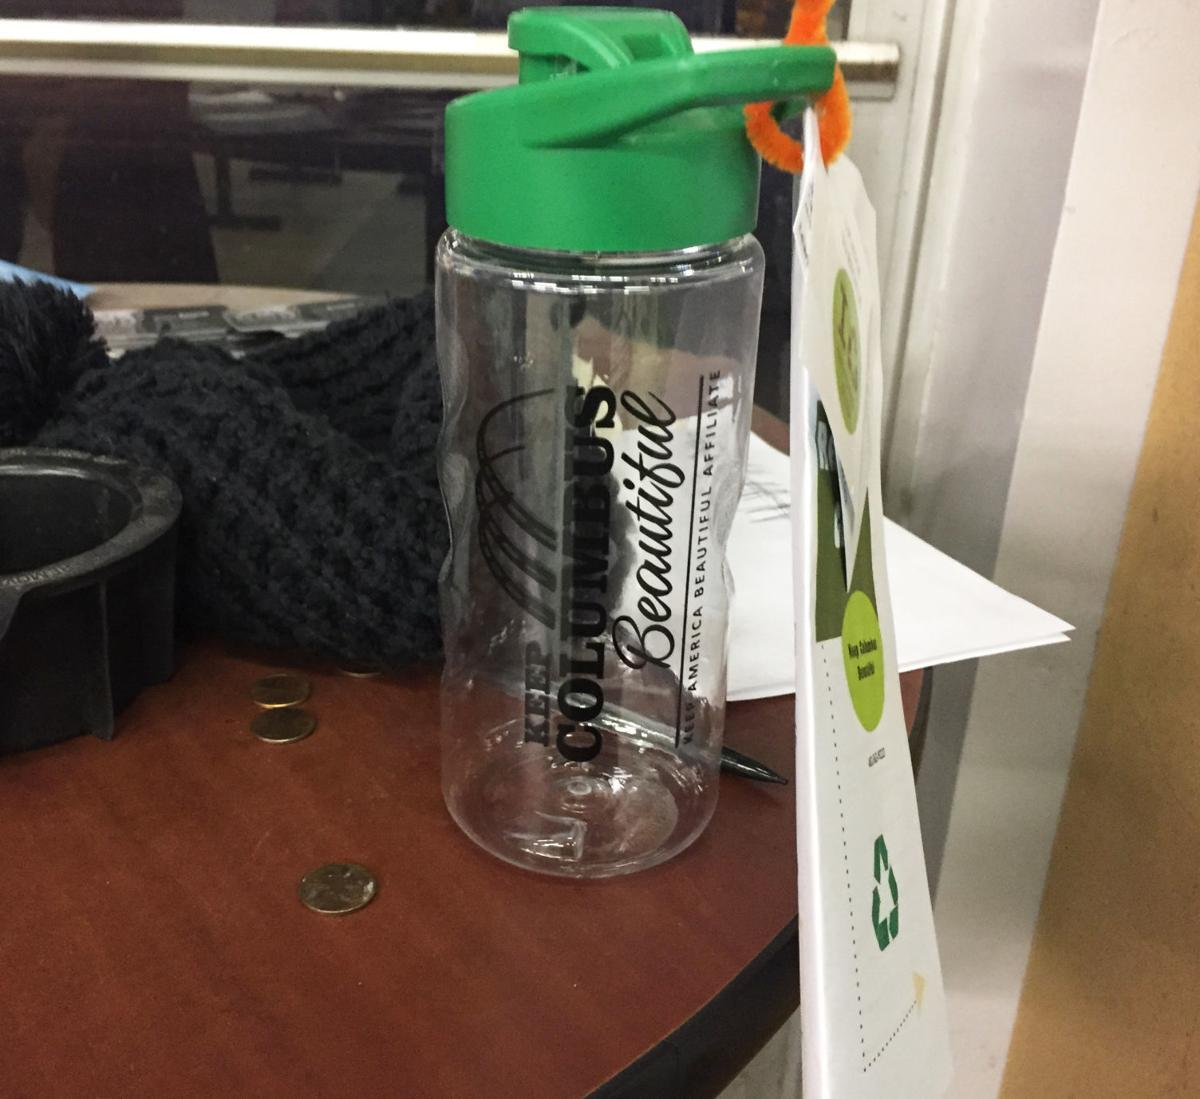 Columbus America Recycles Day 2